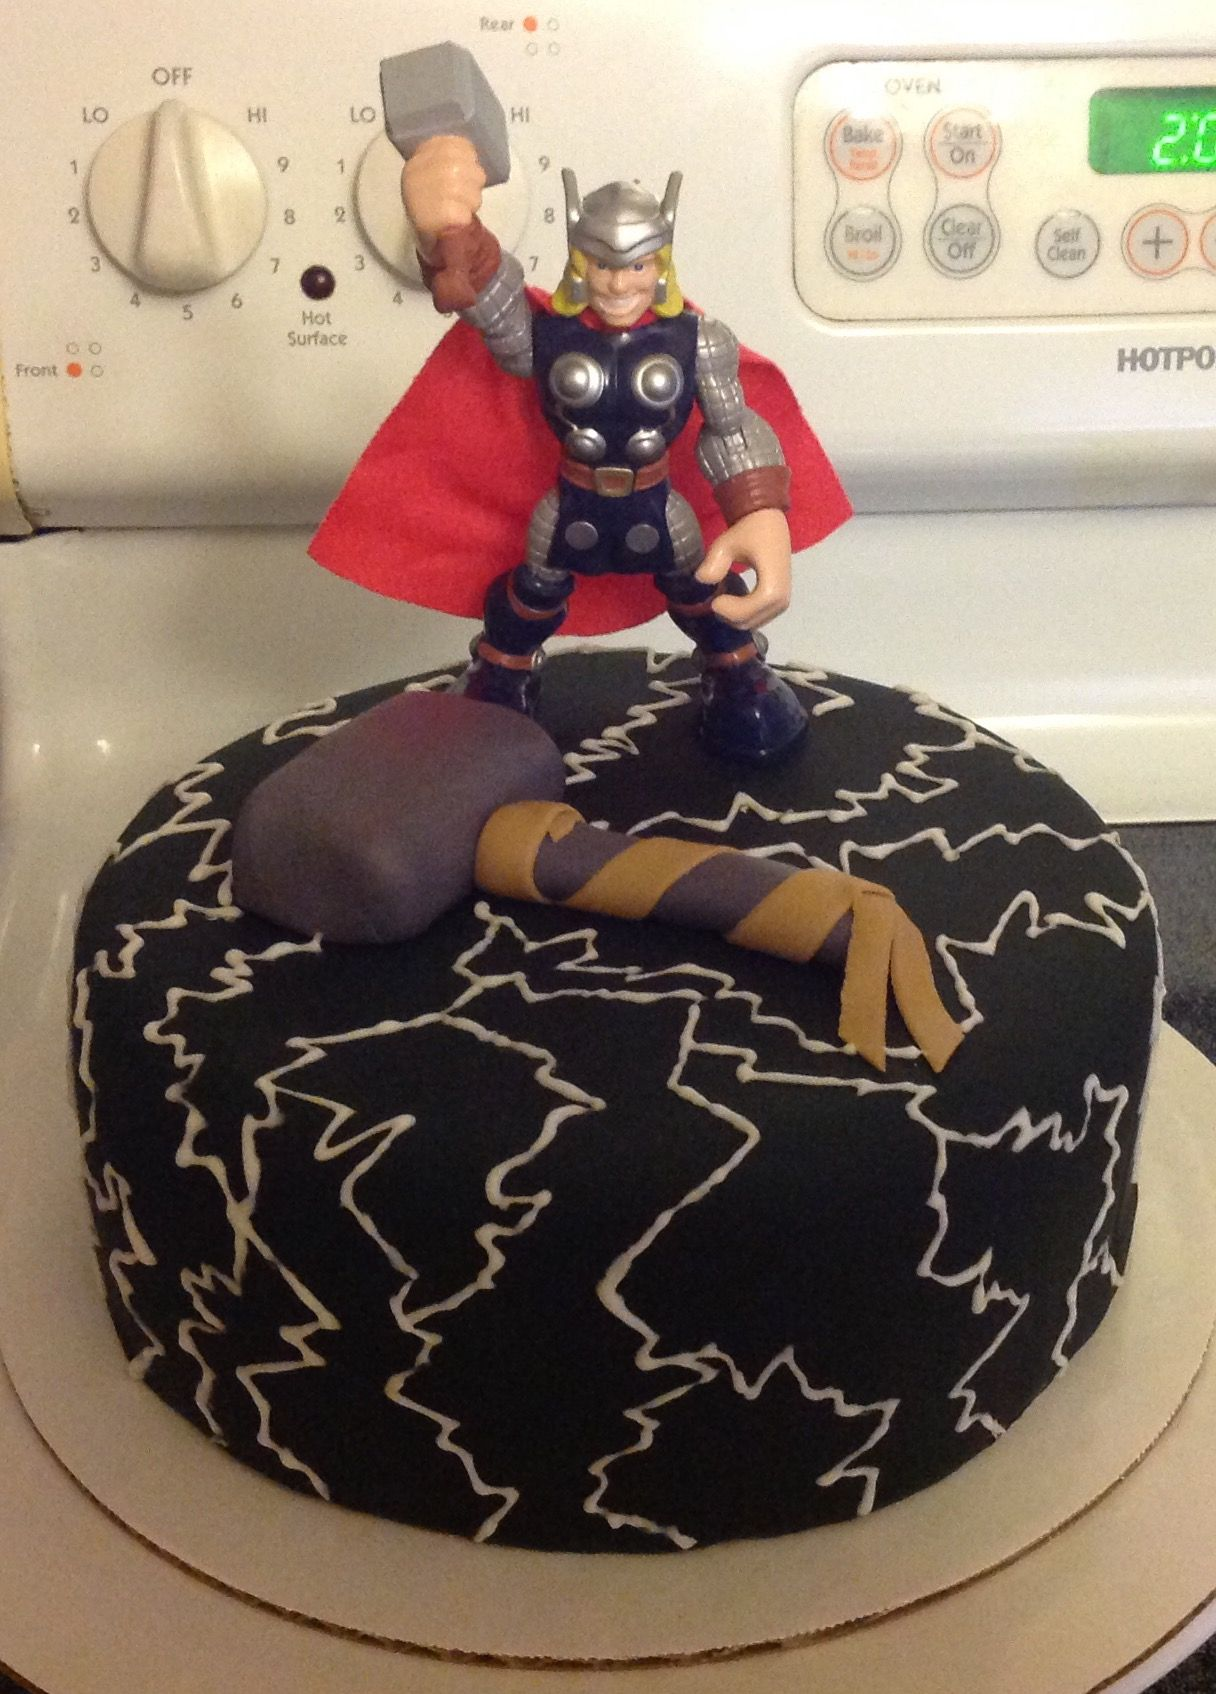 Thor Cake Our Cakes Cake Pops Pinterest Thor Cake Cake And